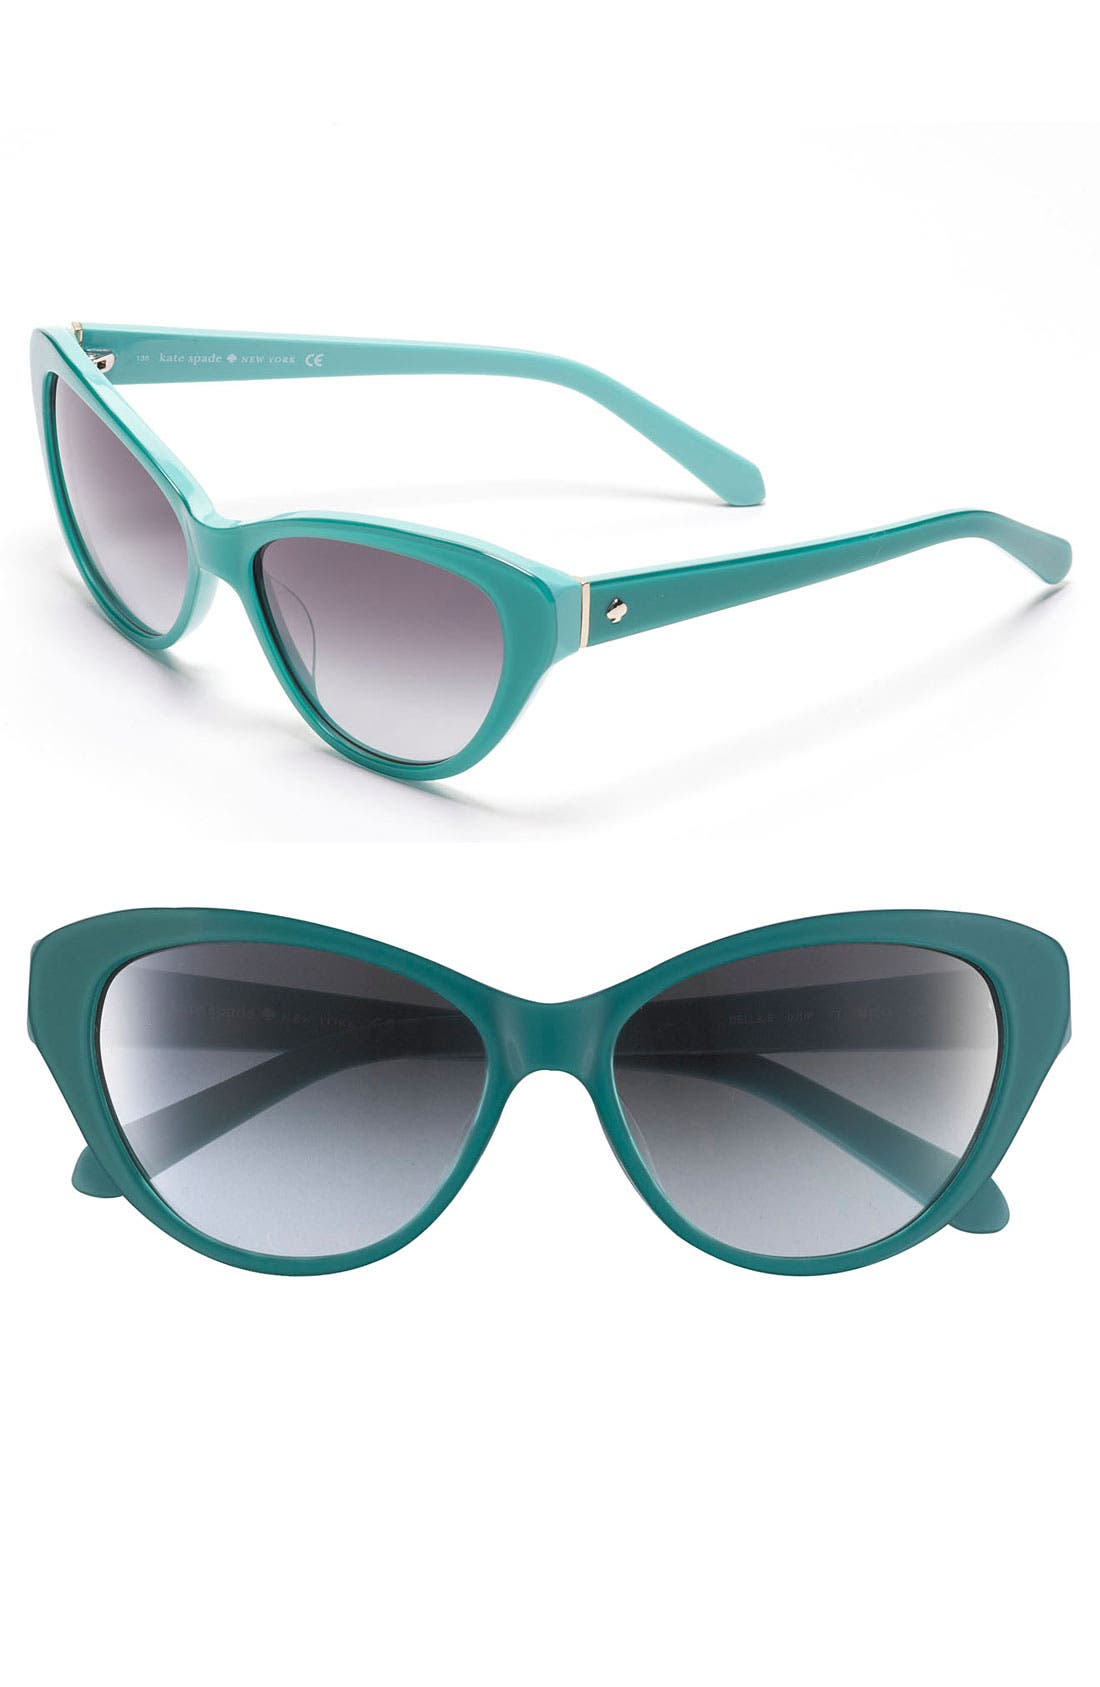 Alternate Image 1 Selected - kate spade new york 'della' 55mm sunglasses